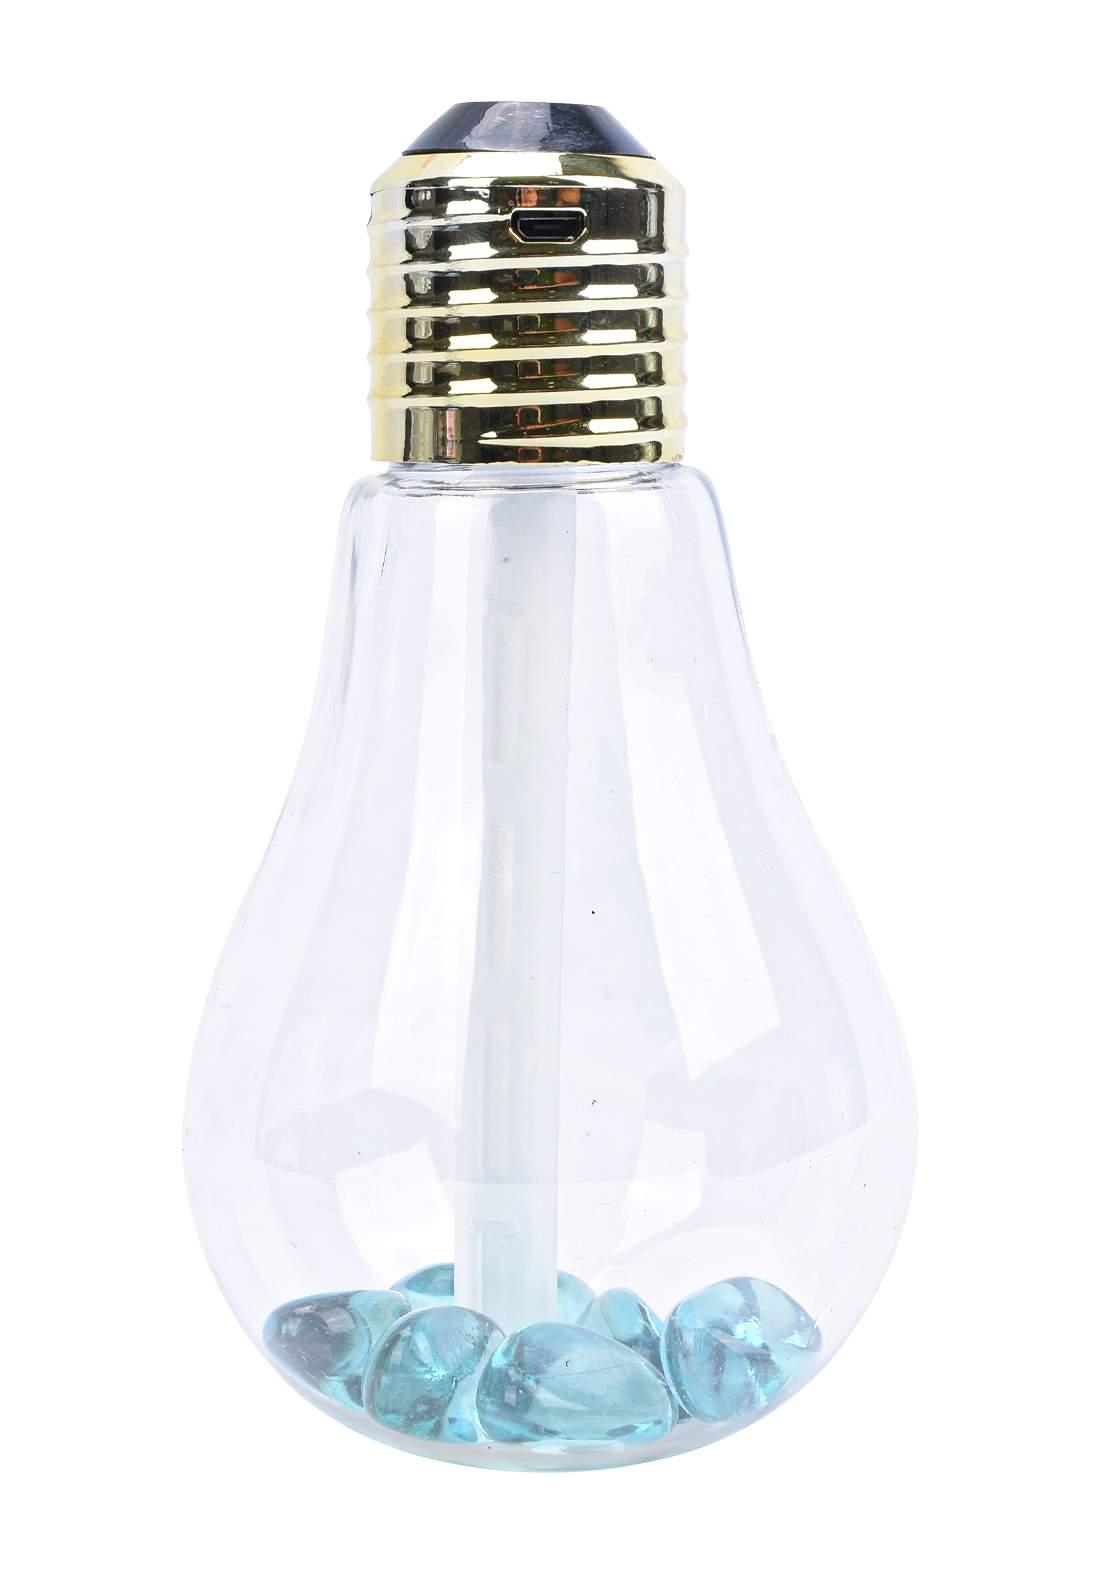 Air Humidifier, Bulb Shape, Night Light, With Spray 400 ml جهاز مرطب للجو